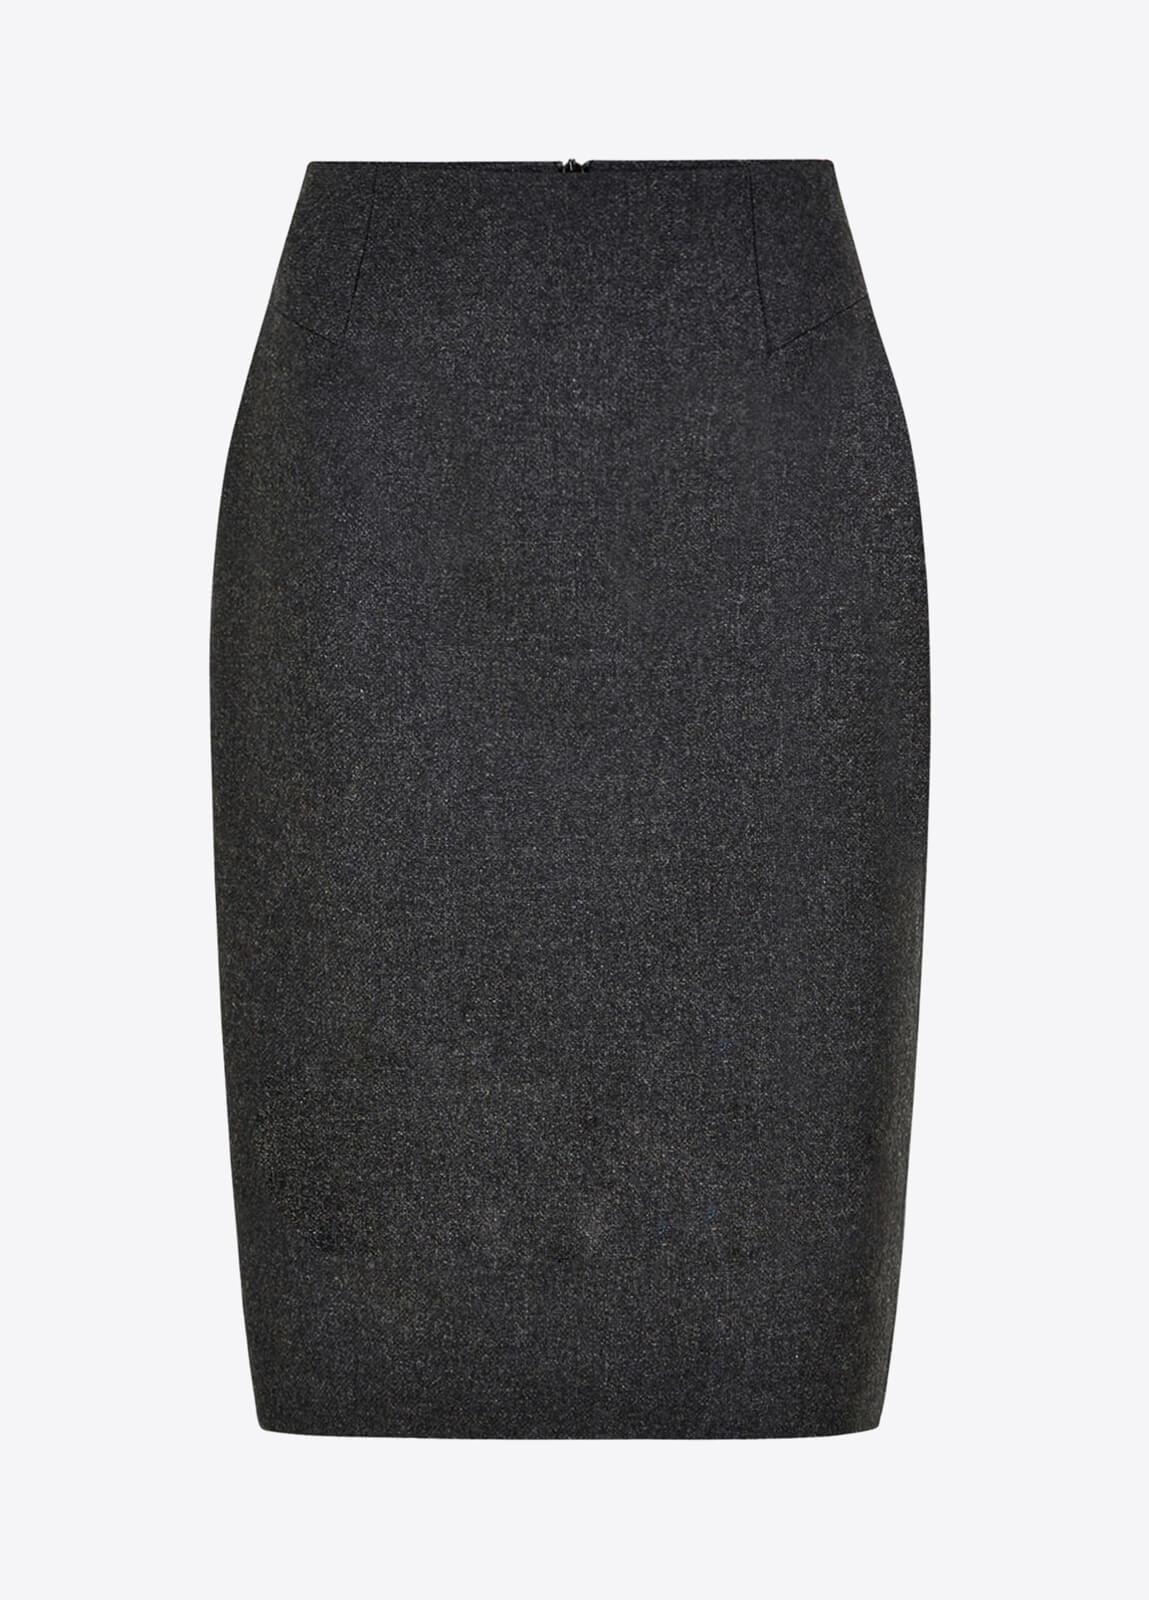 Fern Tweed Skirt - Graphite